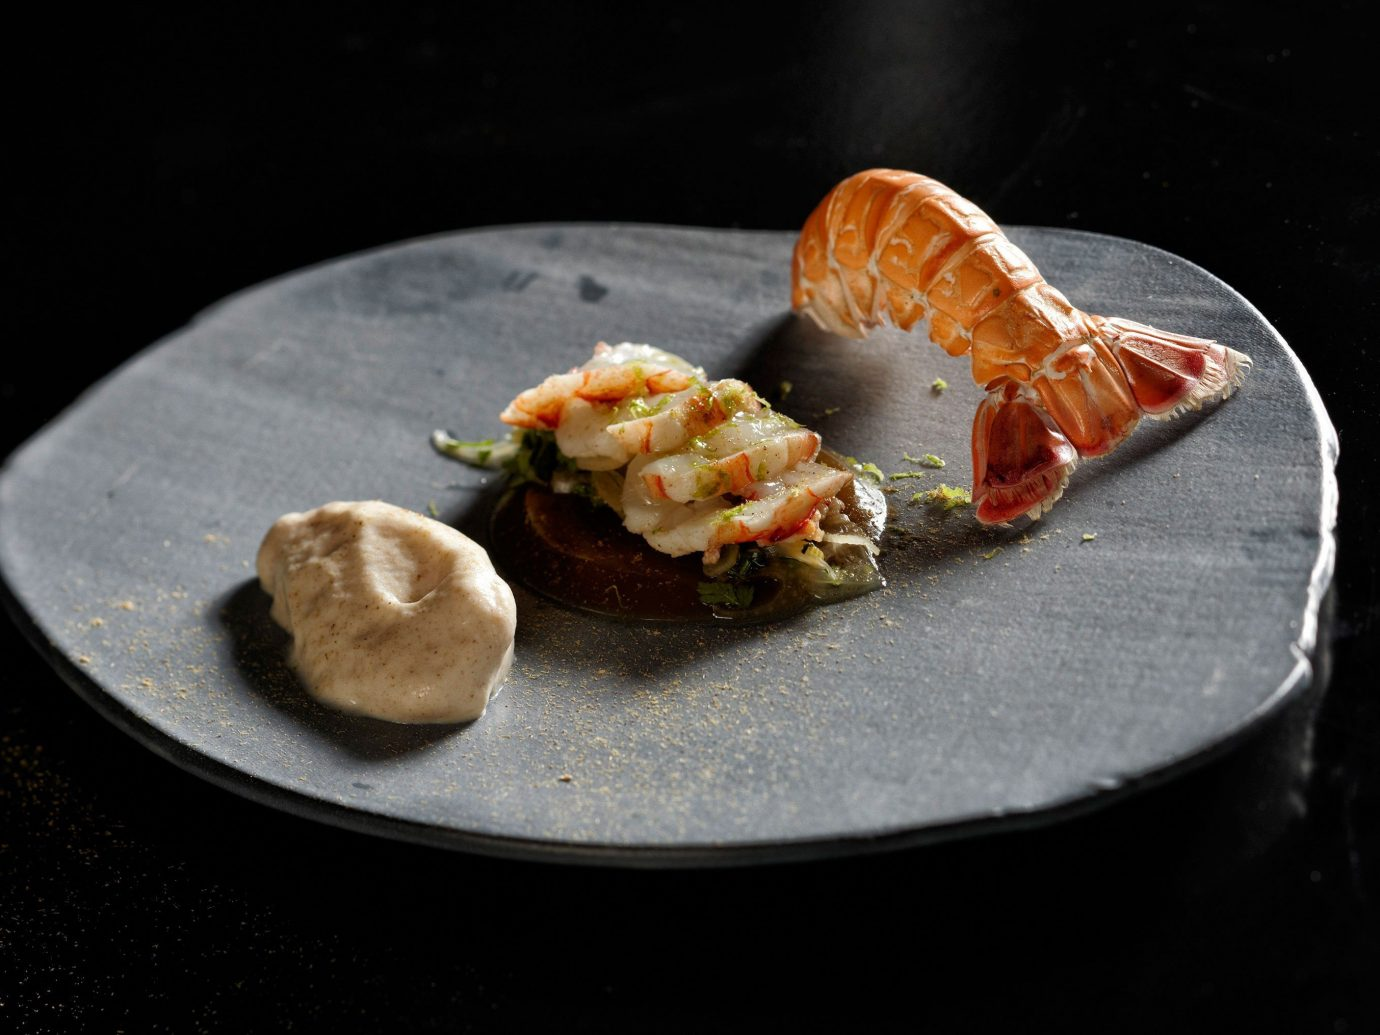 Food + Drink plate slice dish food piece produce cuisine fish meal Seafood breakfast dessert sliced eaten